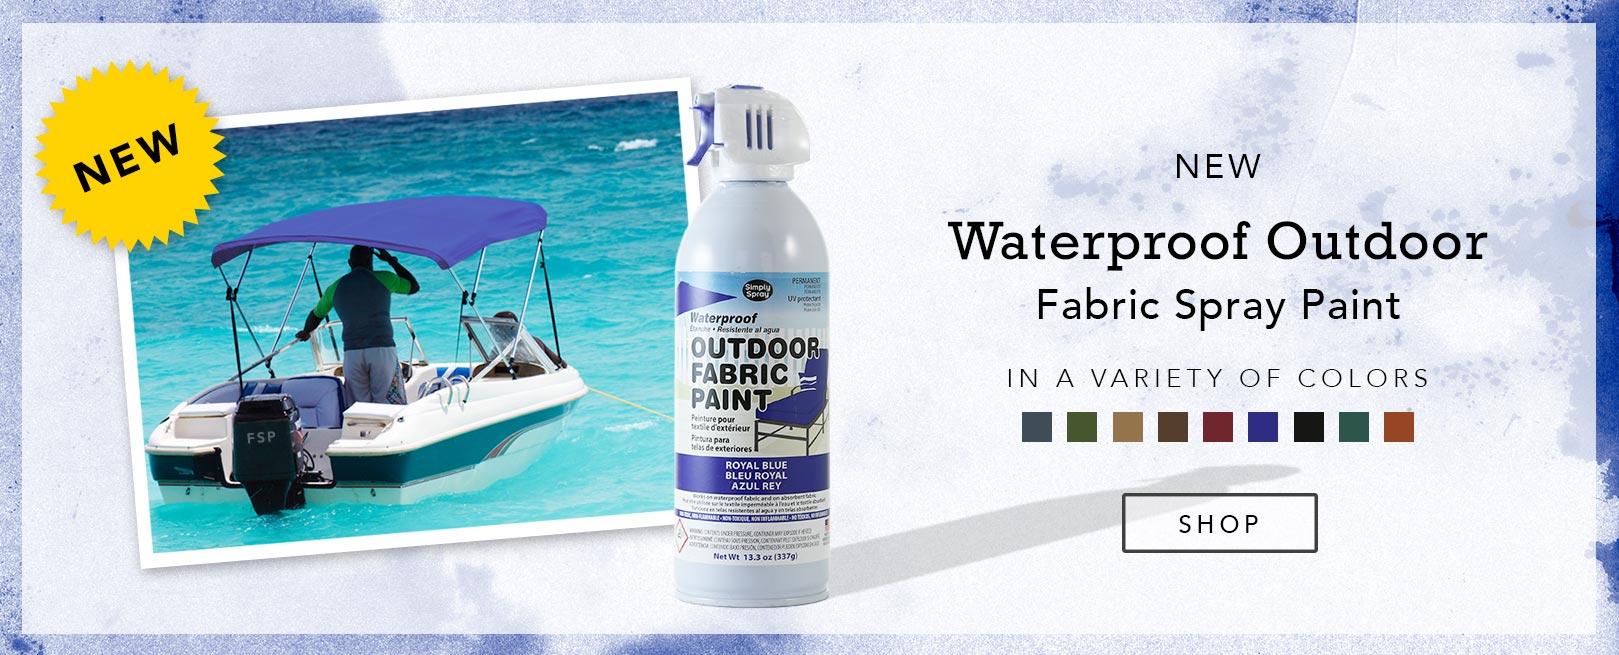 Waterproof Outdoor Fabric Spray Paint